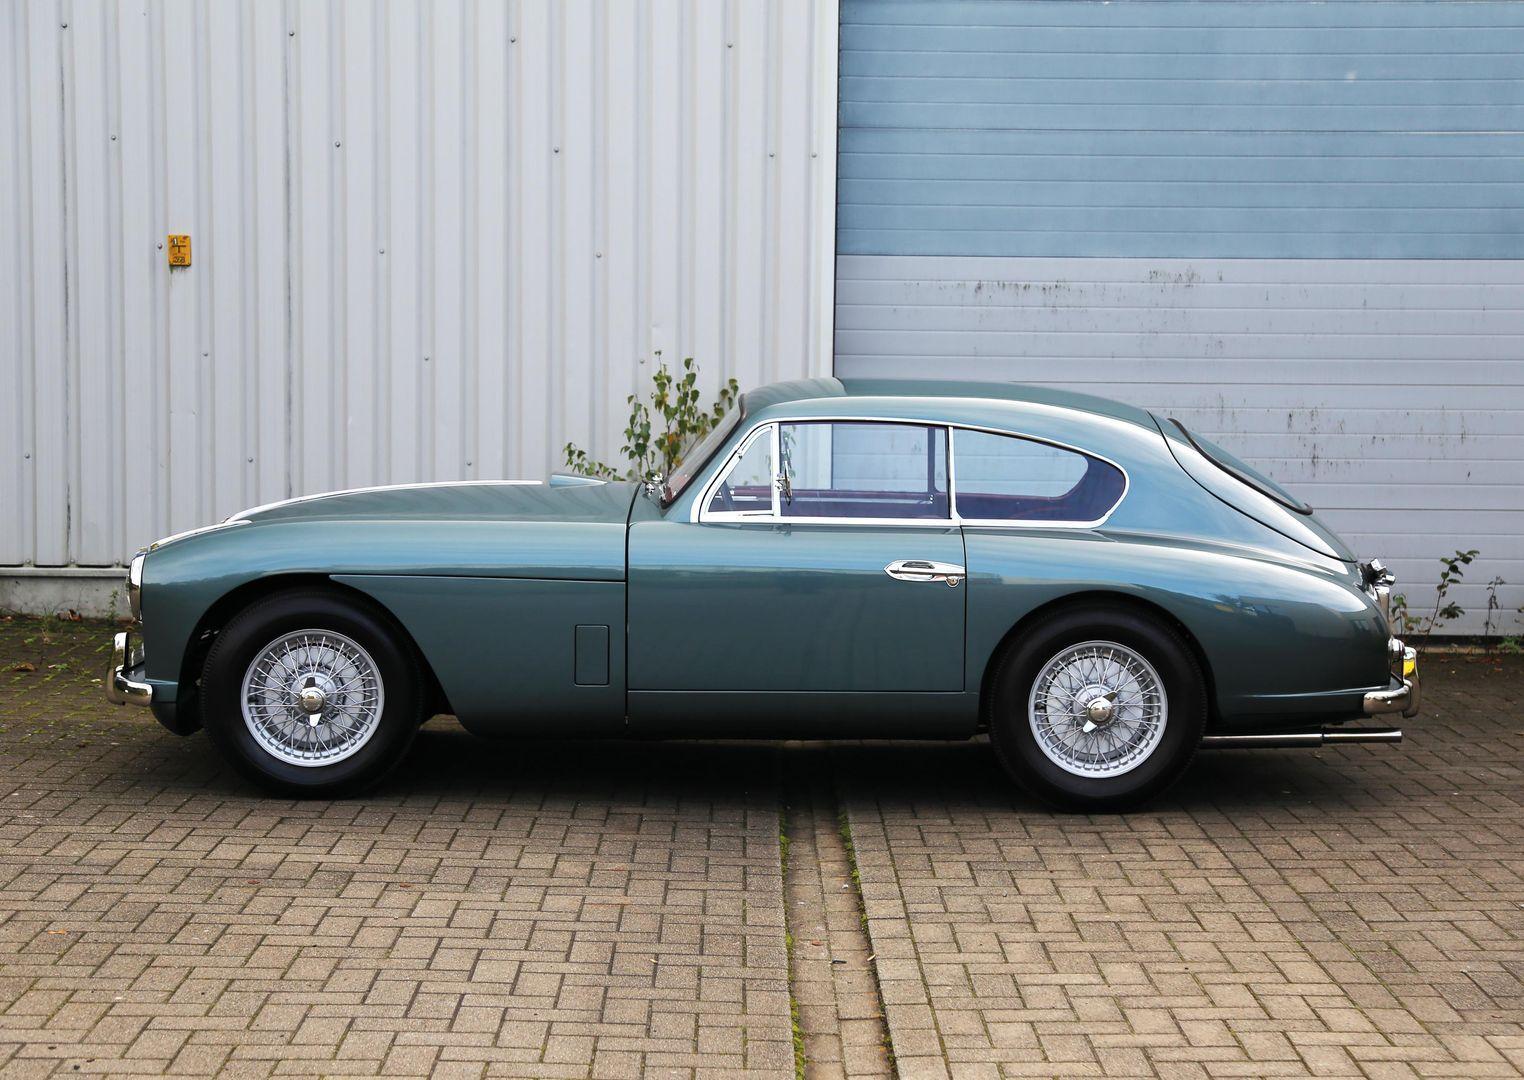 Used Aston Martin Db2 1955 For Sale In Aiken Sc Car Cave Usa Aston Martin Db2 Used Aston Martin Aston Martin